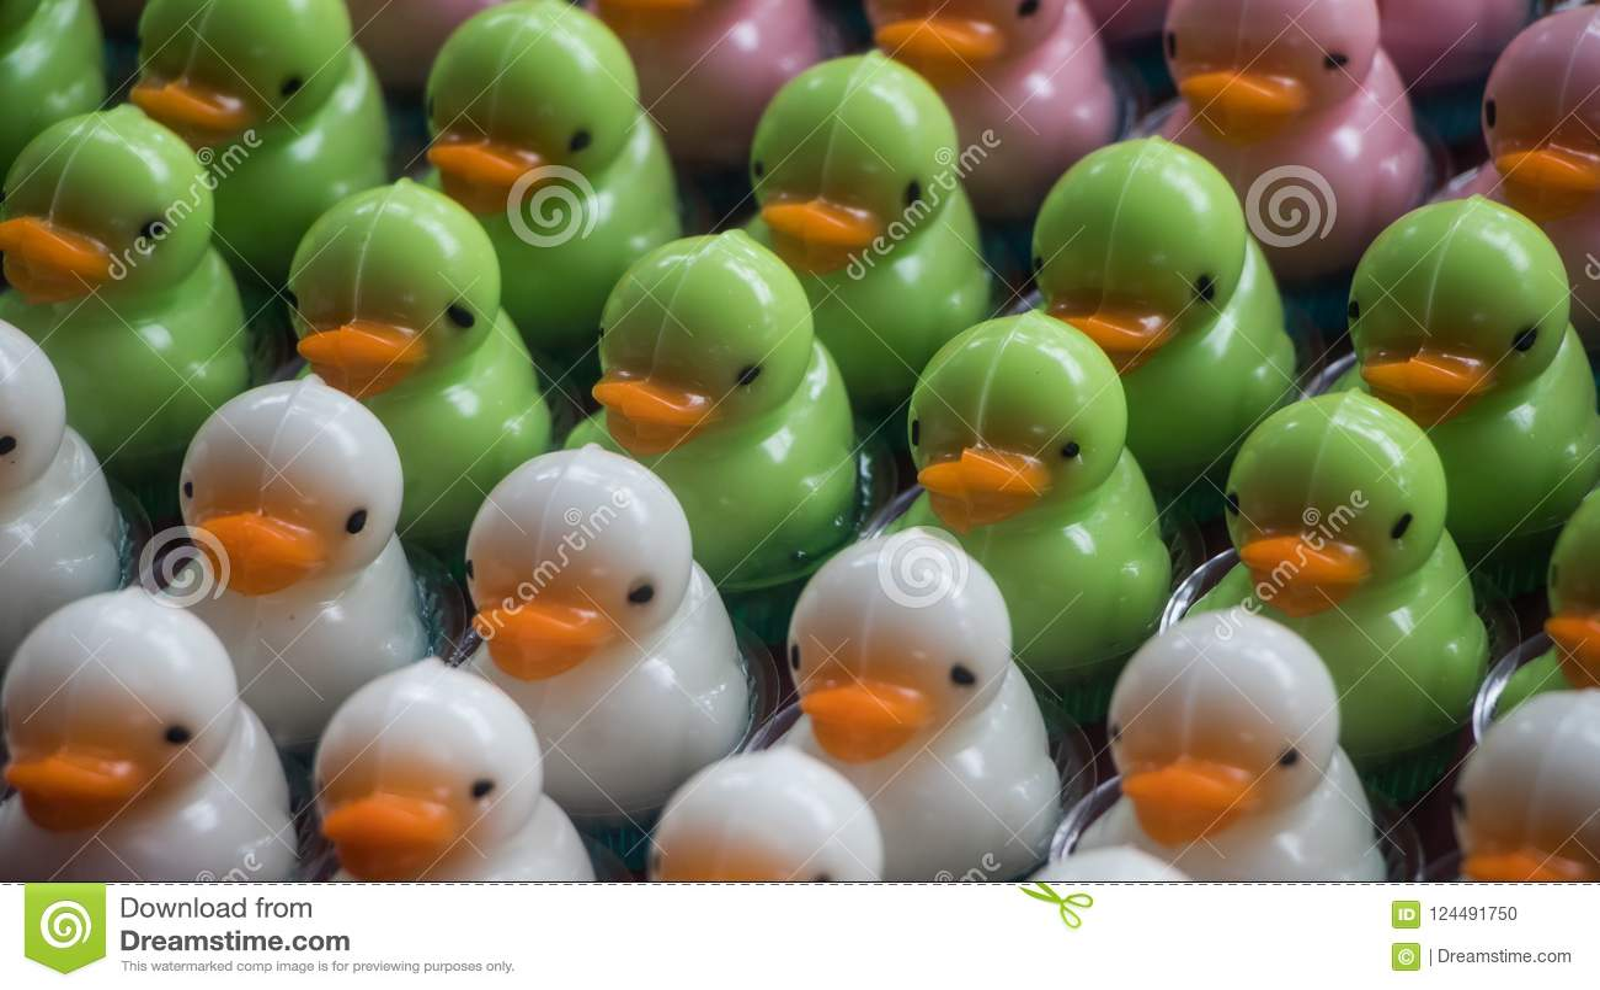 Miniature duck-shaped desserts